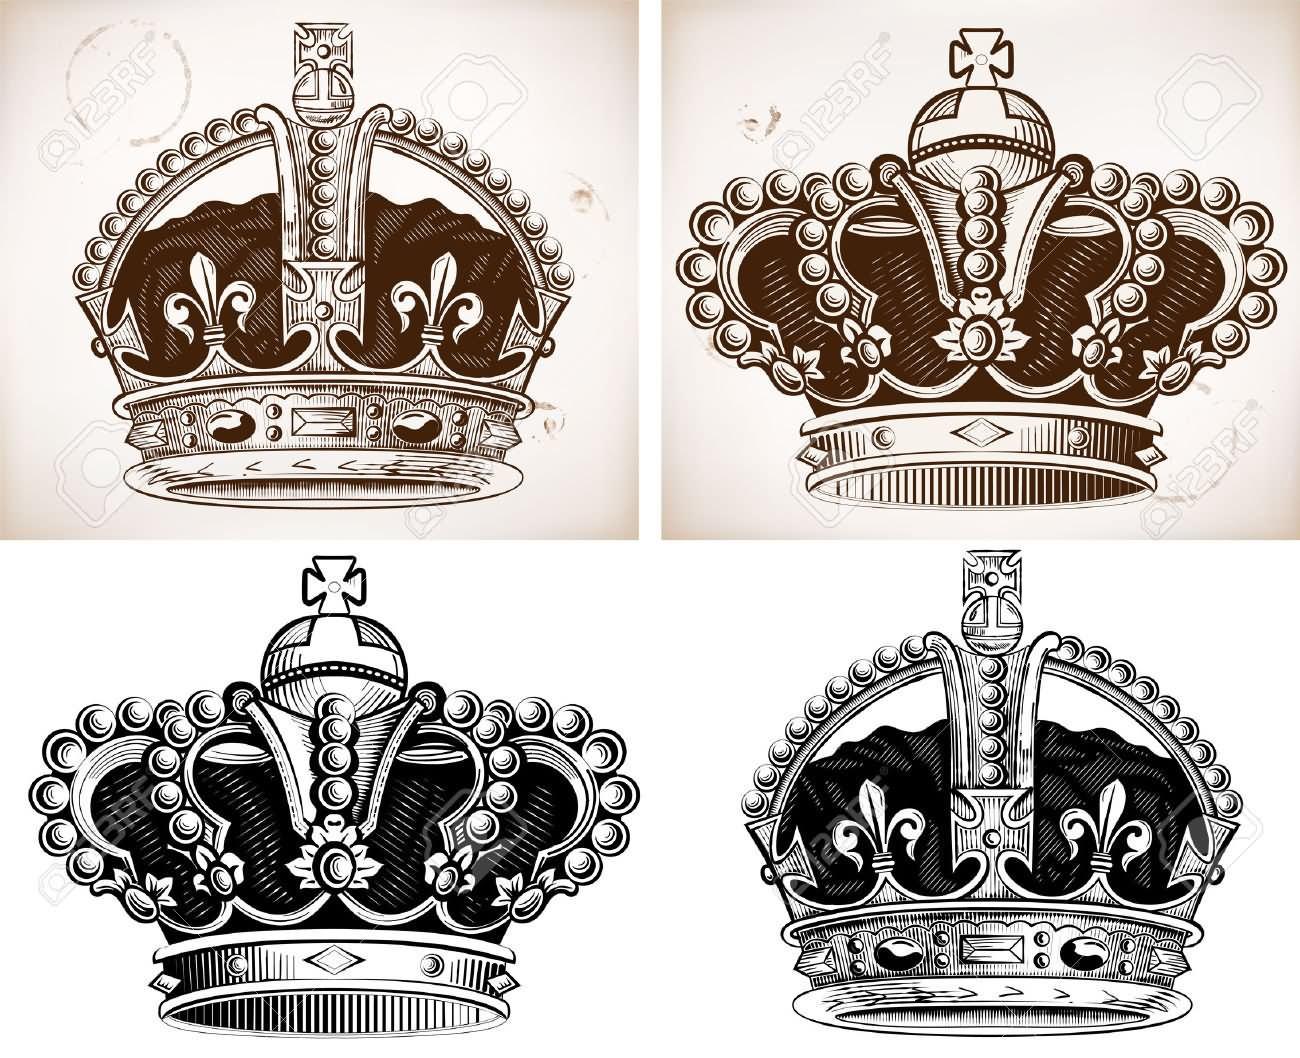 1300x1058 King Crown Tattoos Designs